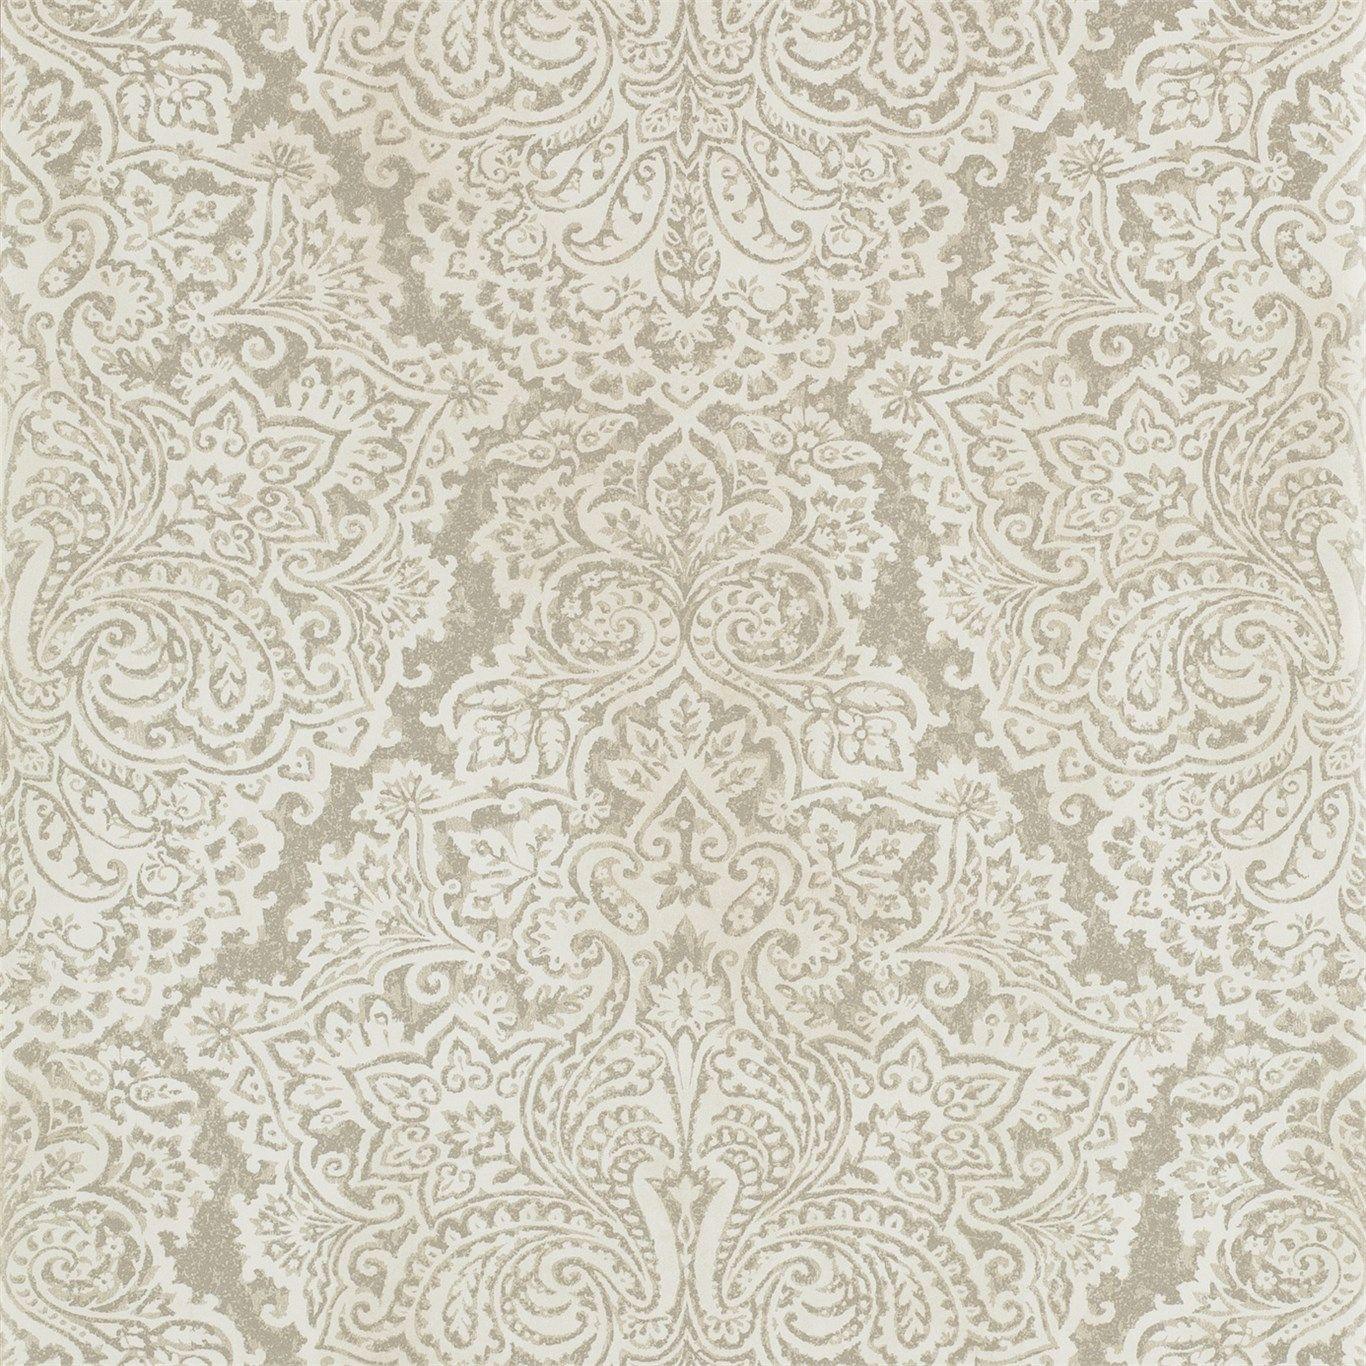 Products | Harlequin - Designer Fabrics and Wallpapers | Aurelia ...